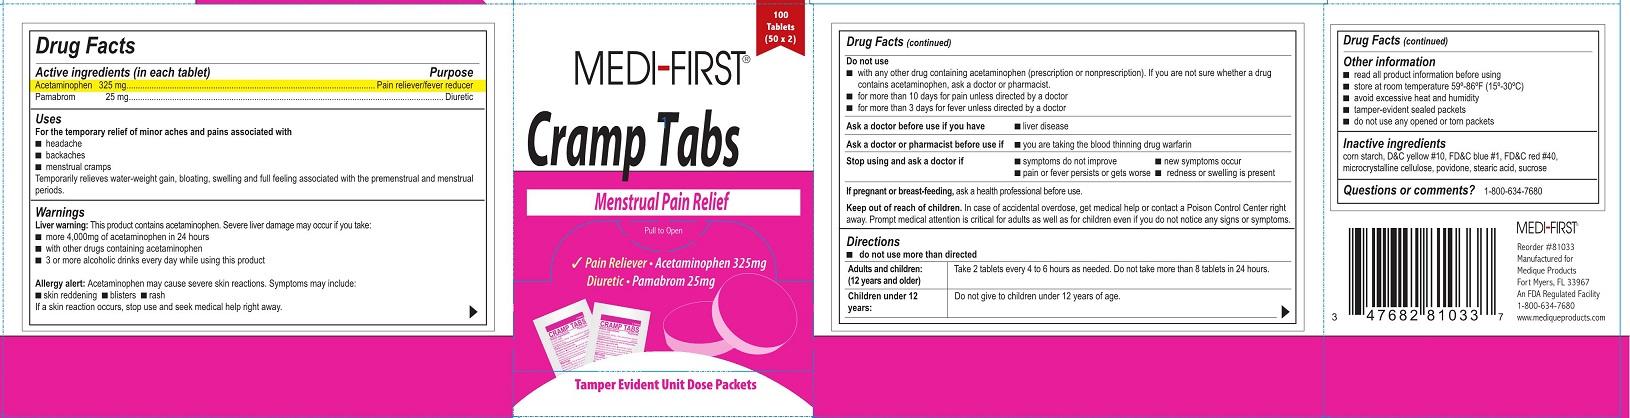 edi-First Cramp Tabs